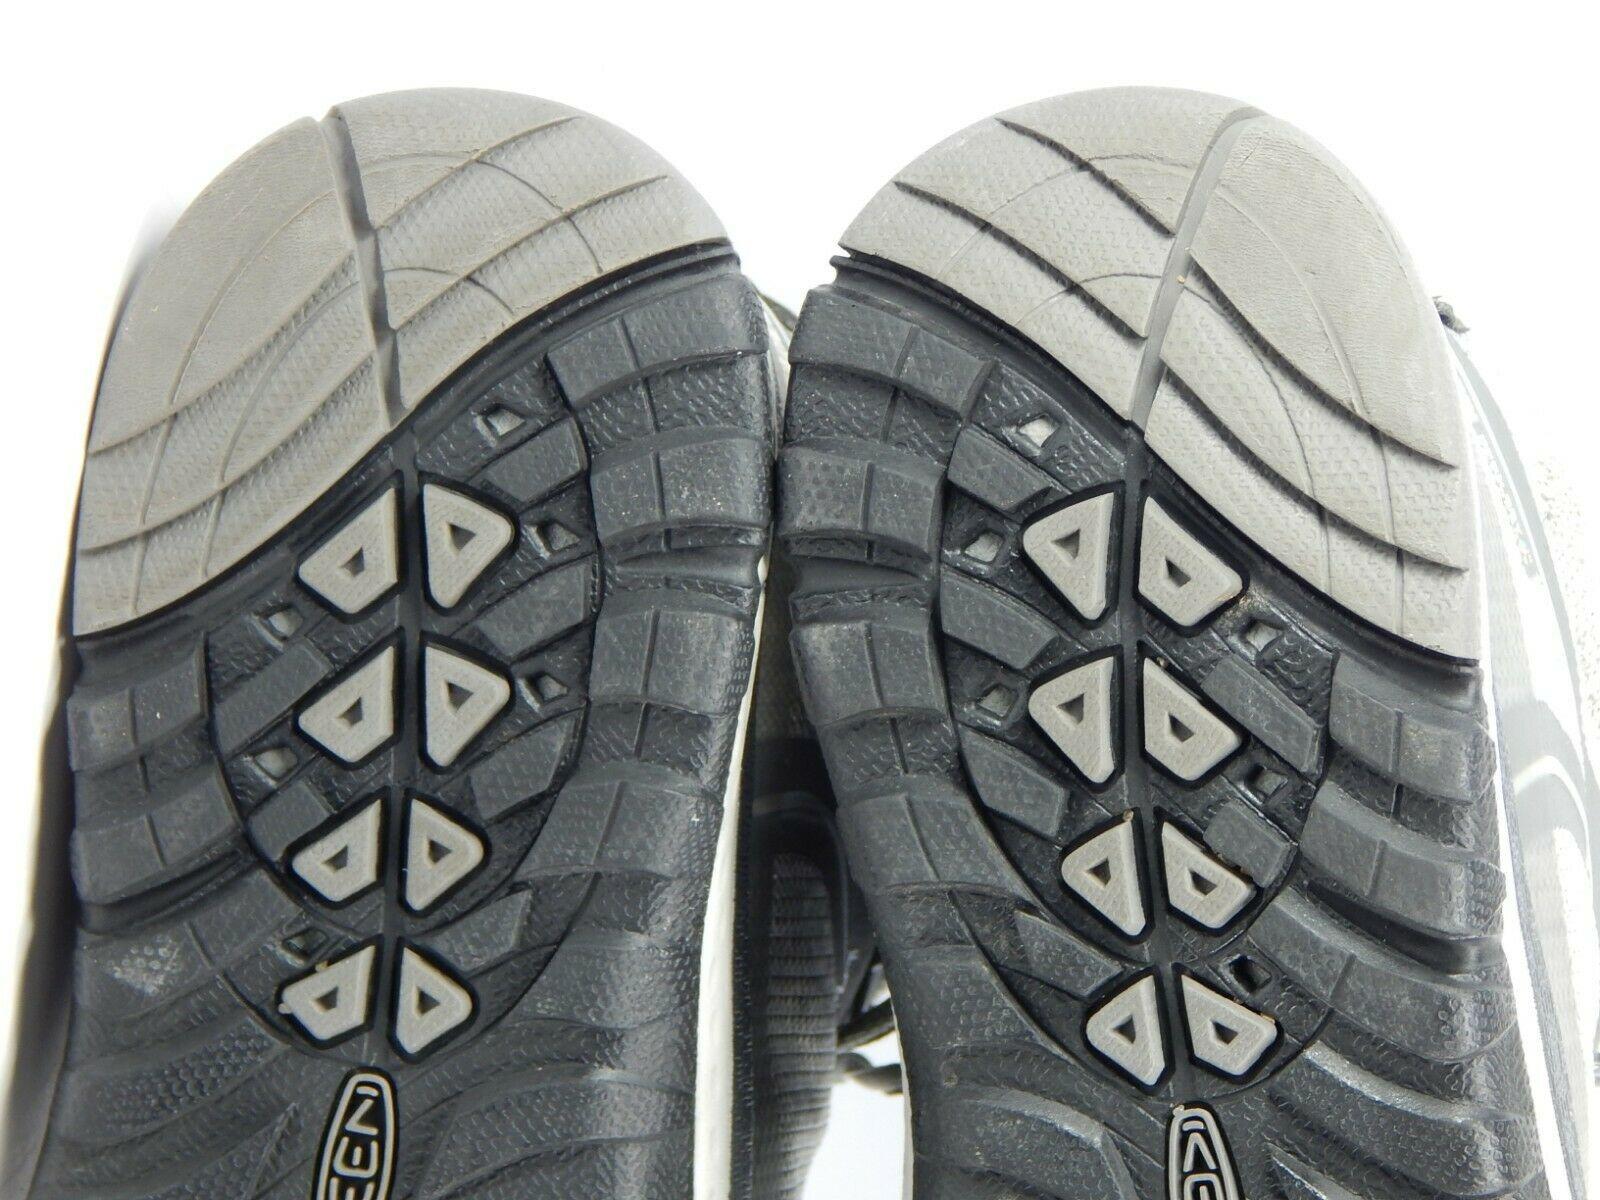 Keen Terradora Mid Size 10 M (B) EU 40.5 Women's WP Trail Hiking Boots 1016505